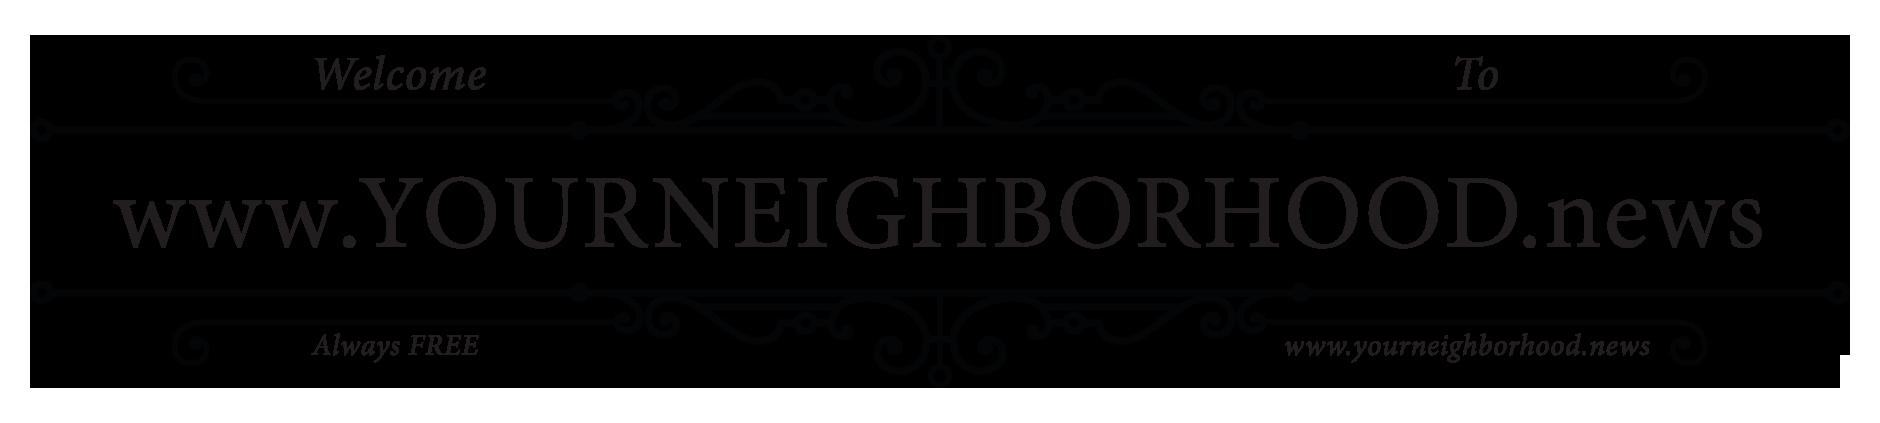 Welcome to the Neighborhood Letter Inspirational Wel E to the Neighborhood News Foley Mn